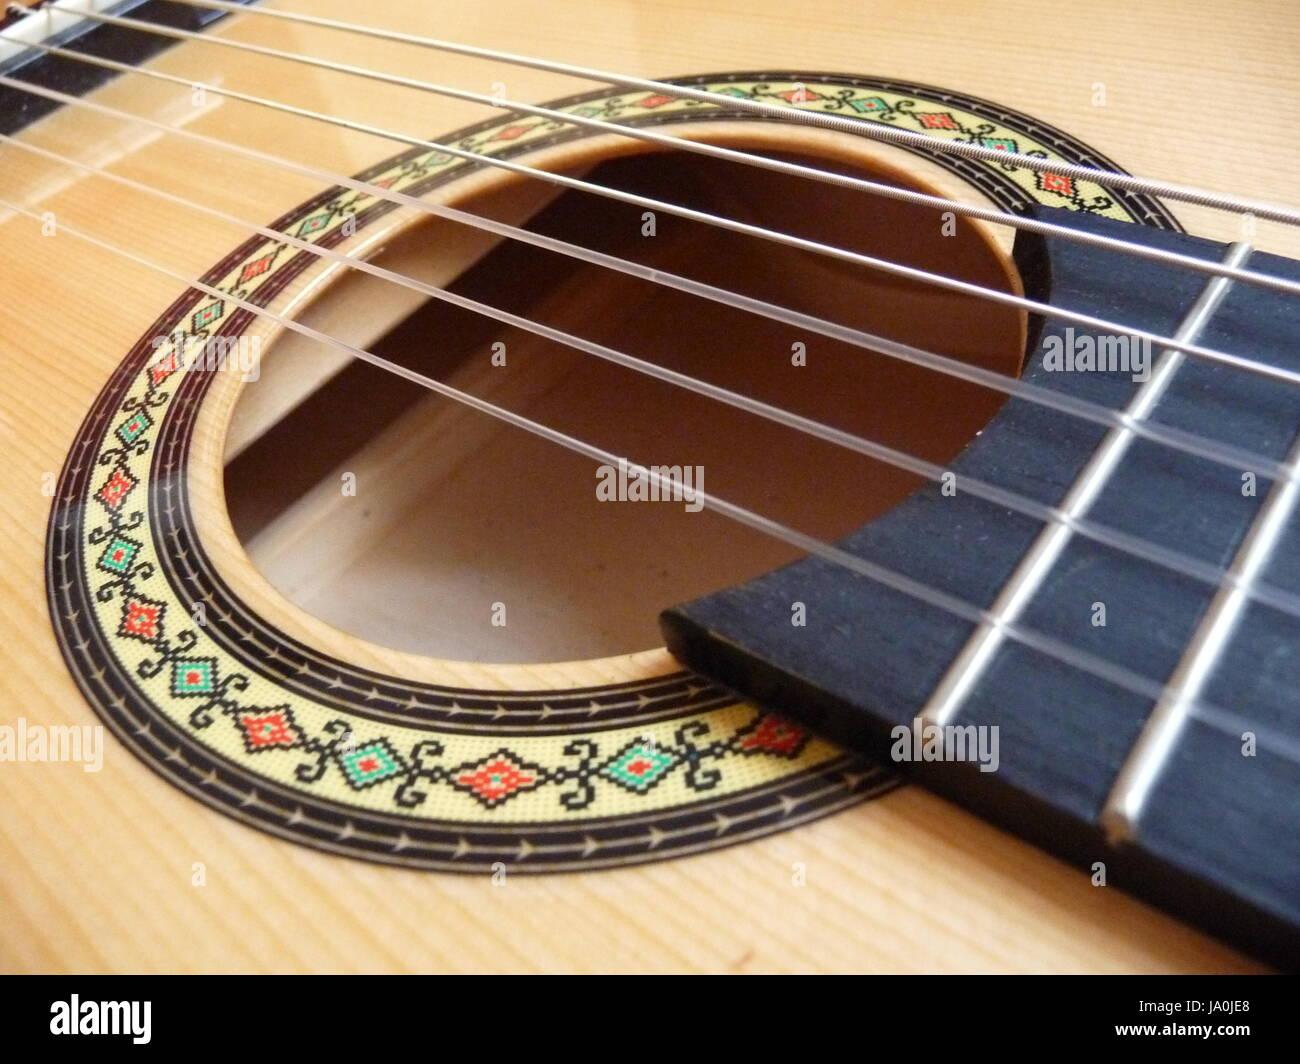 music sound wood guitar strings measure instrument method stock photo royalty free image. Black Bedroom Furniture Sets. Home Design Ideas